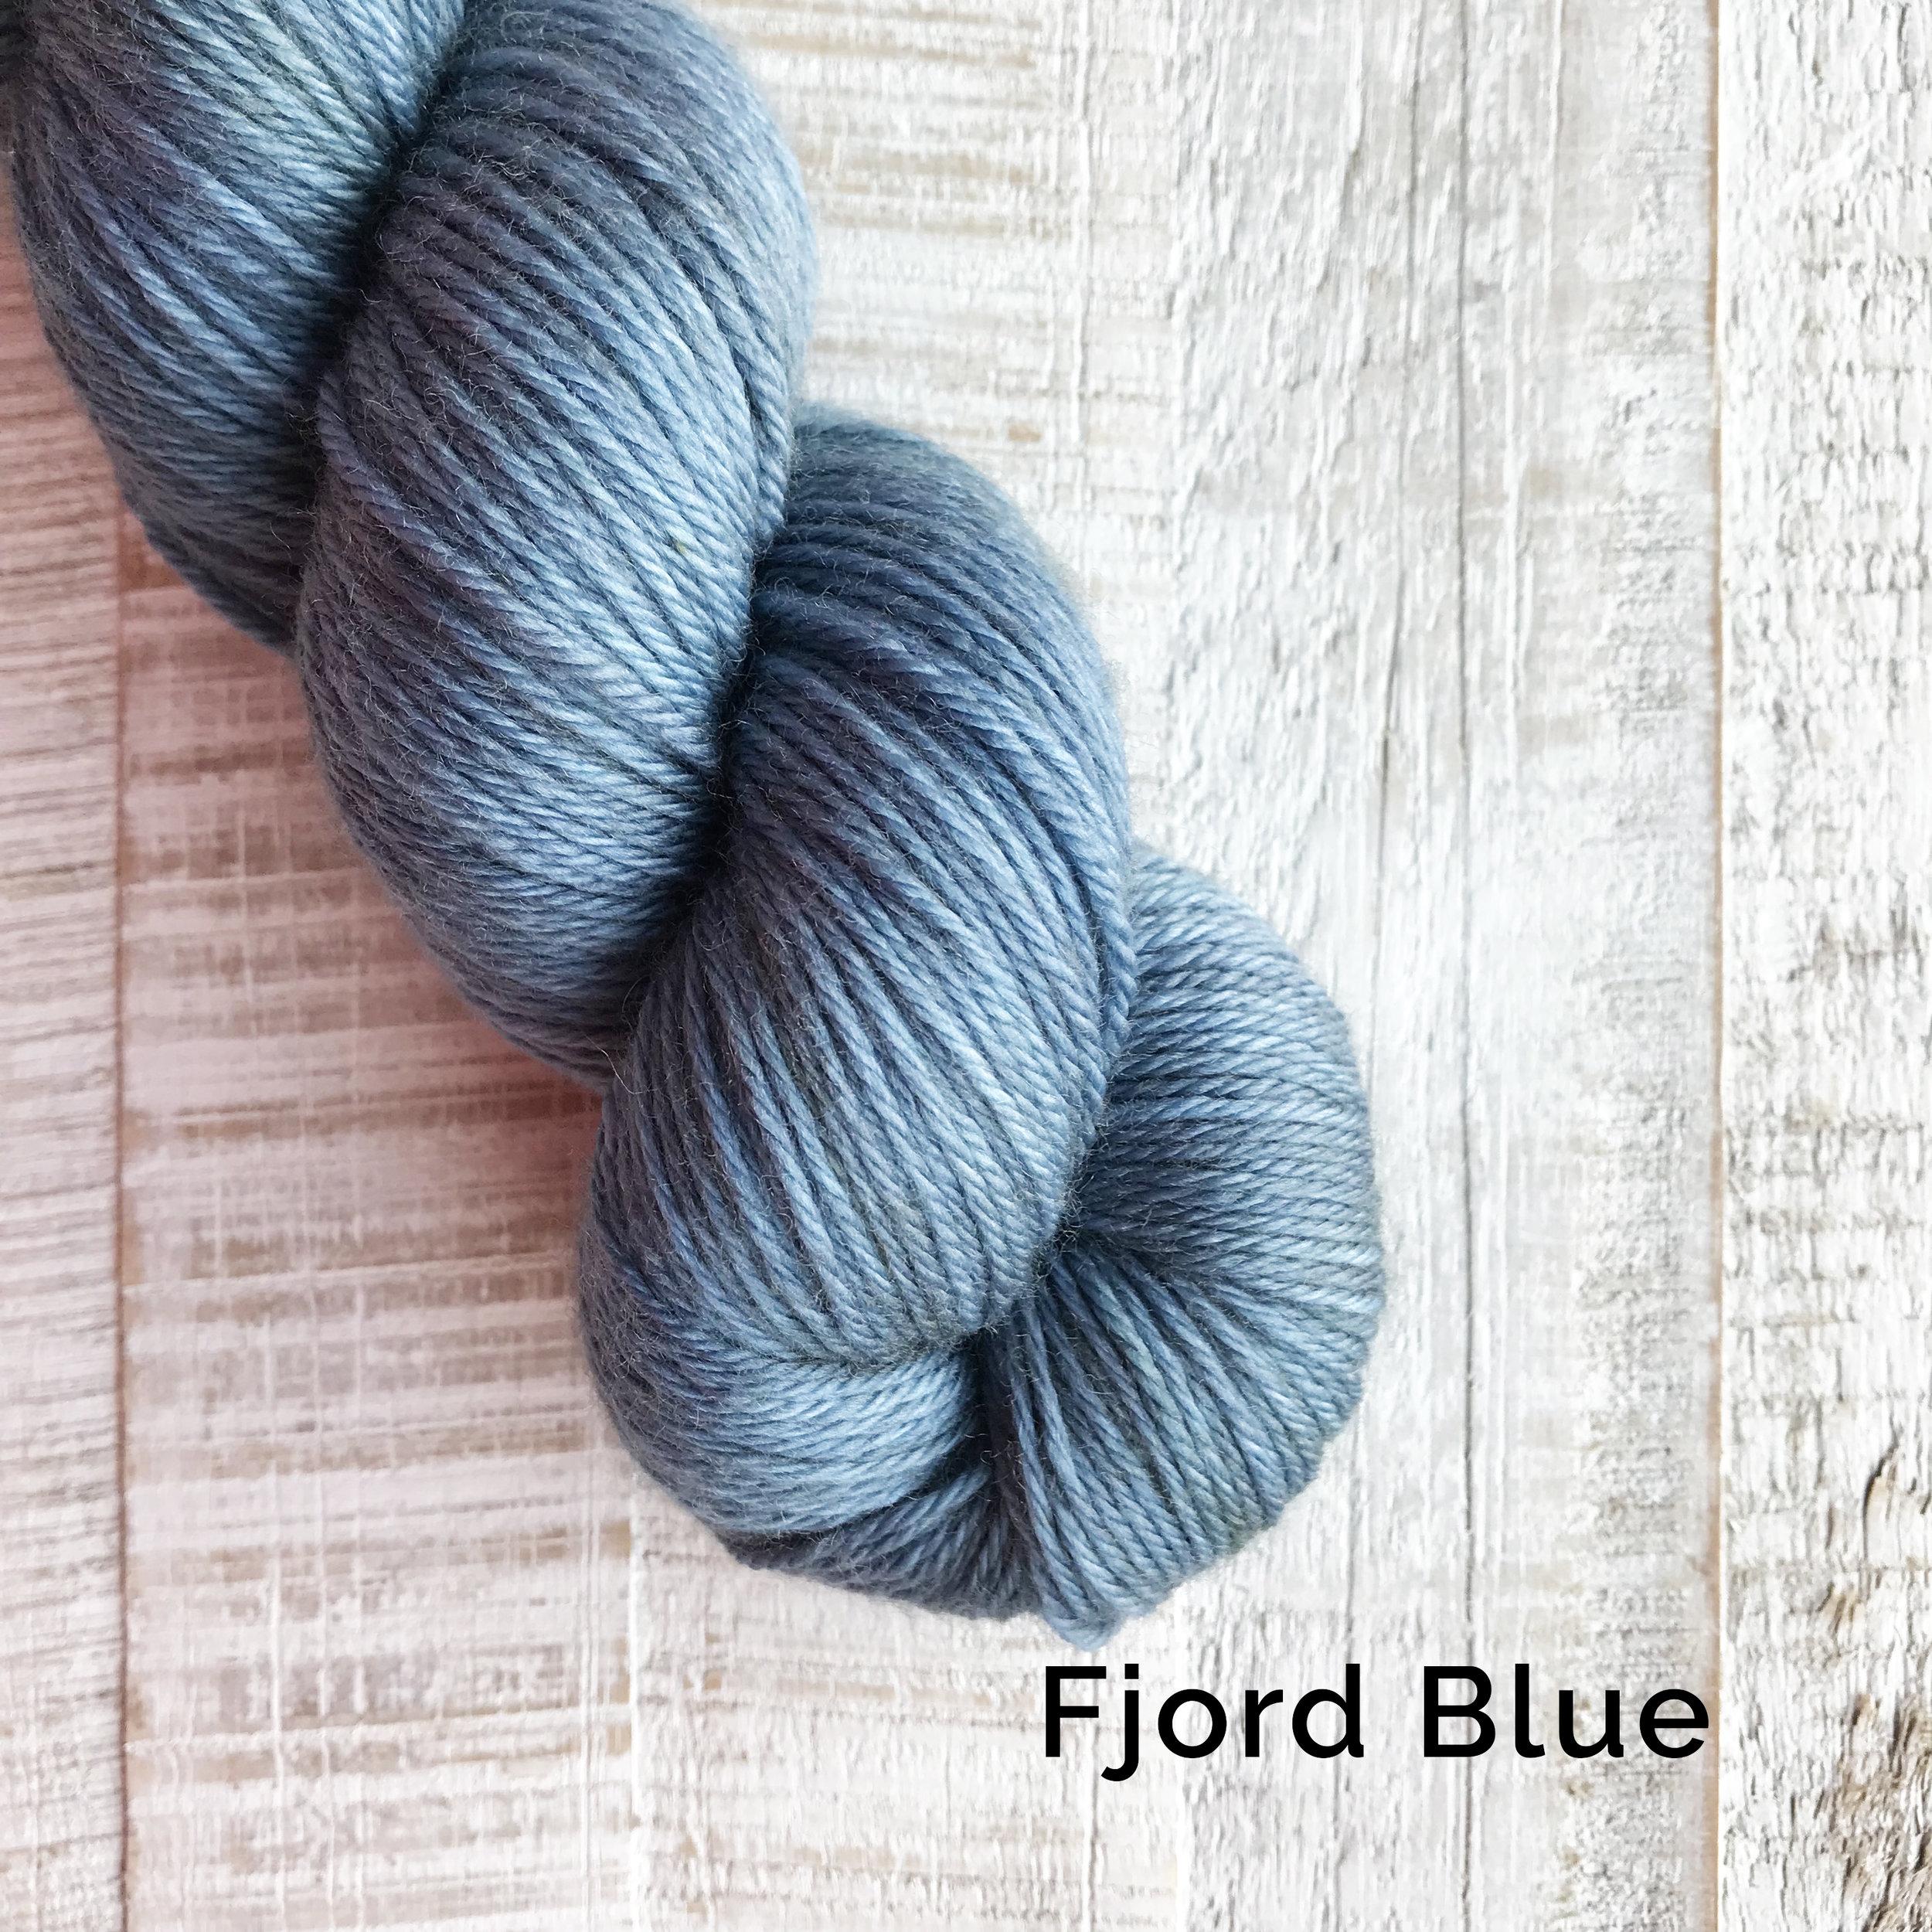 FjordBlue.jpg